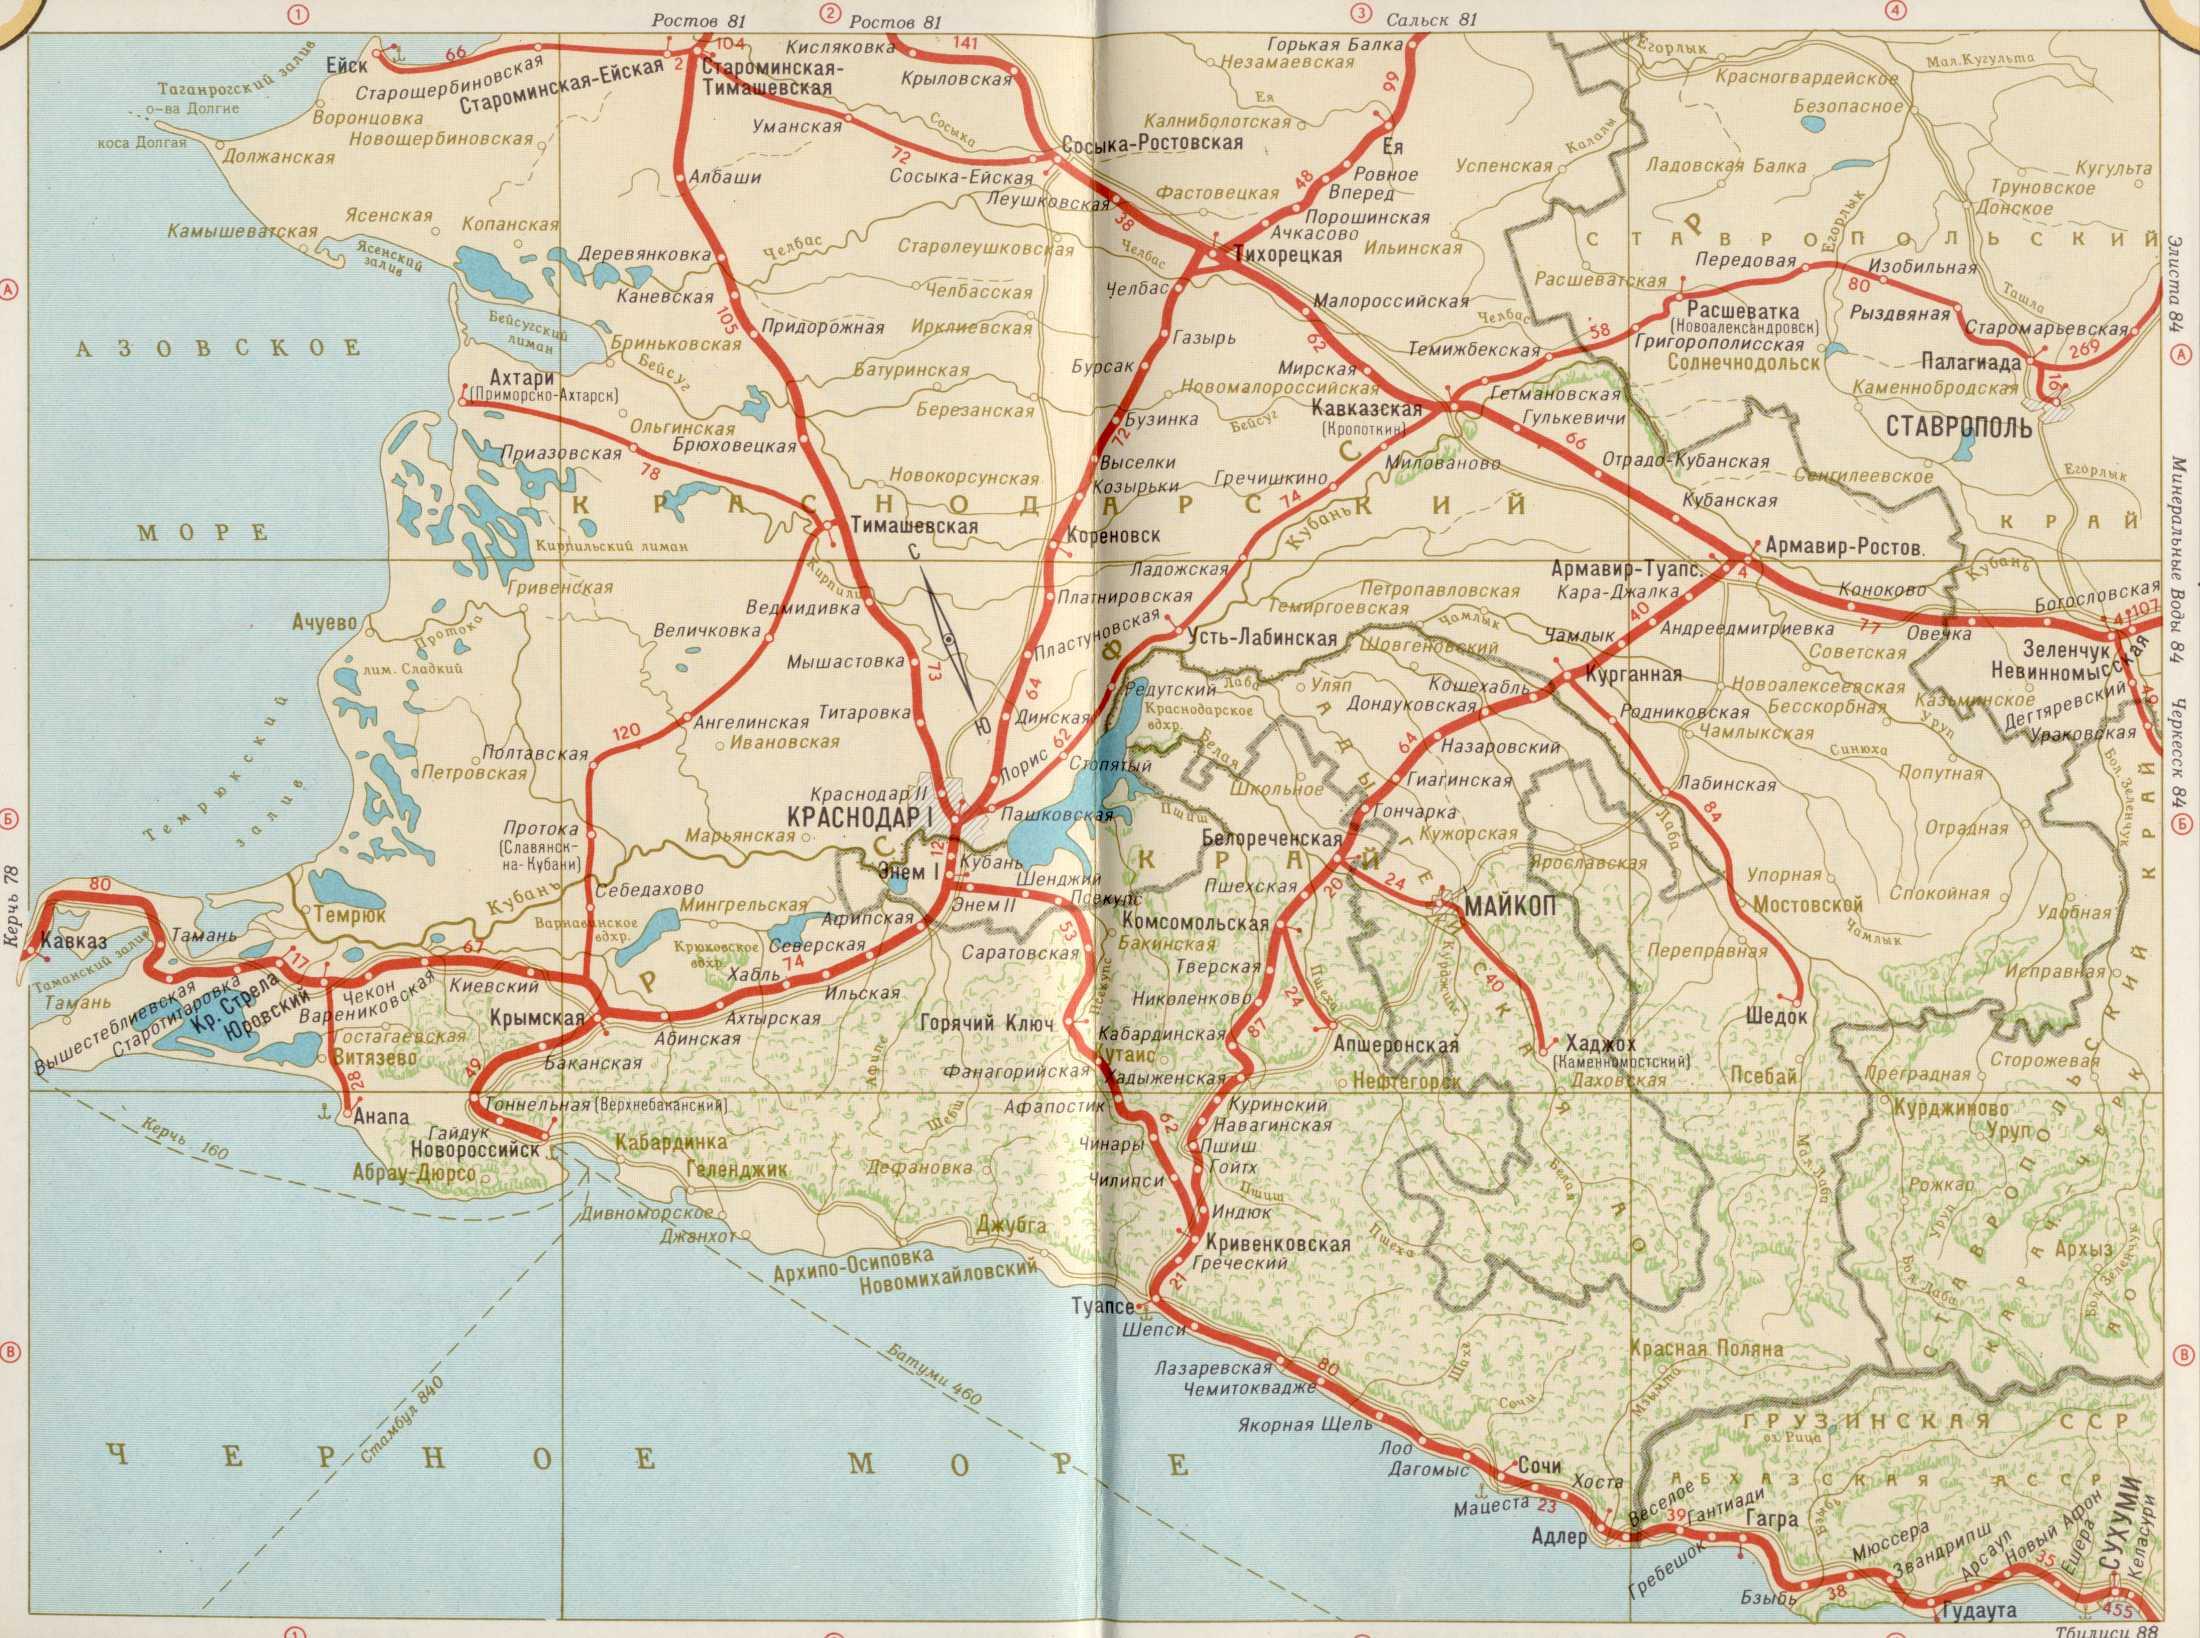 Карта железных дорог краснодарского